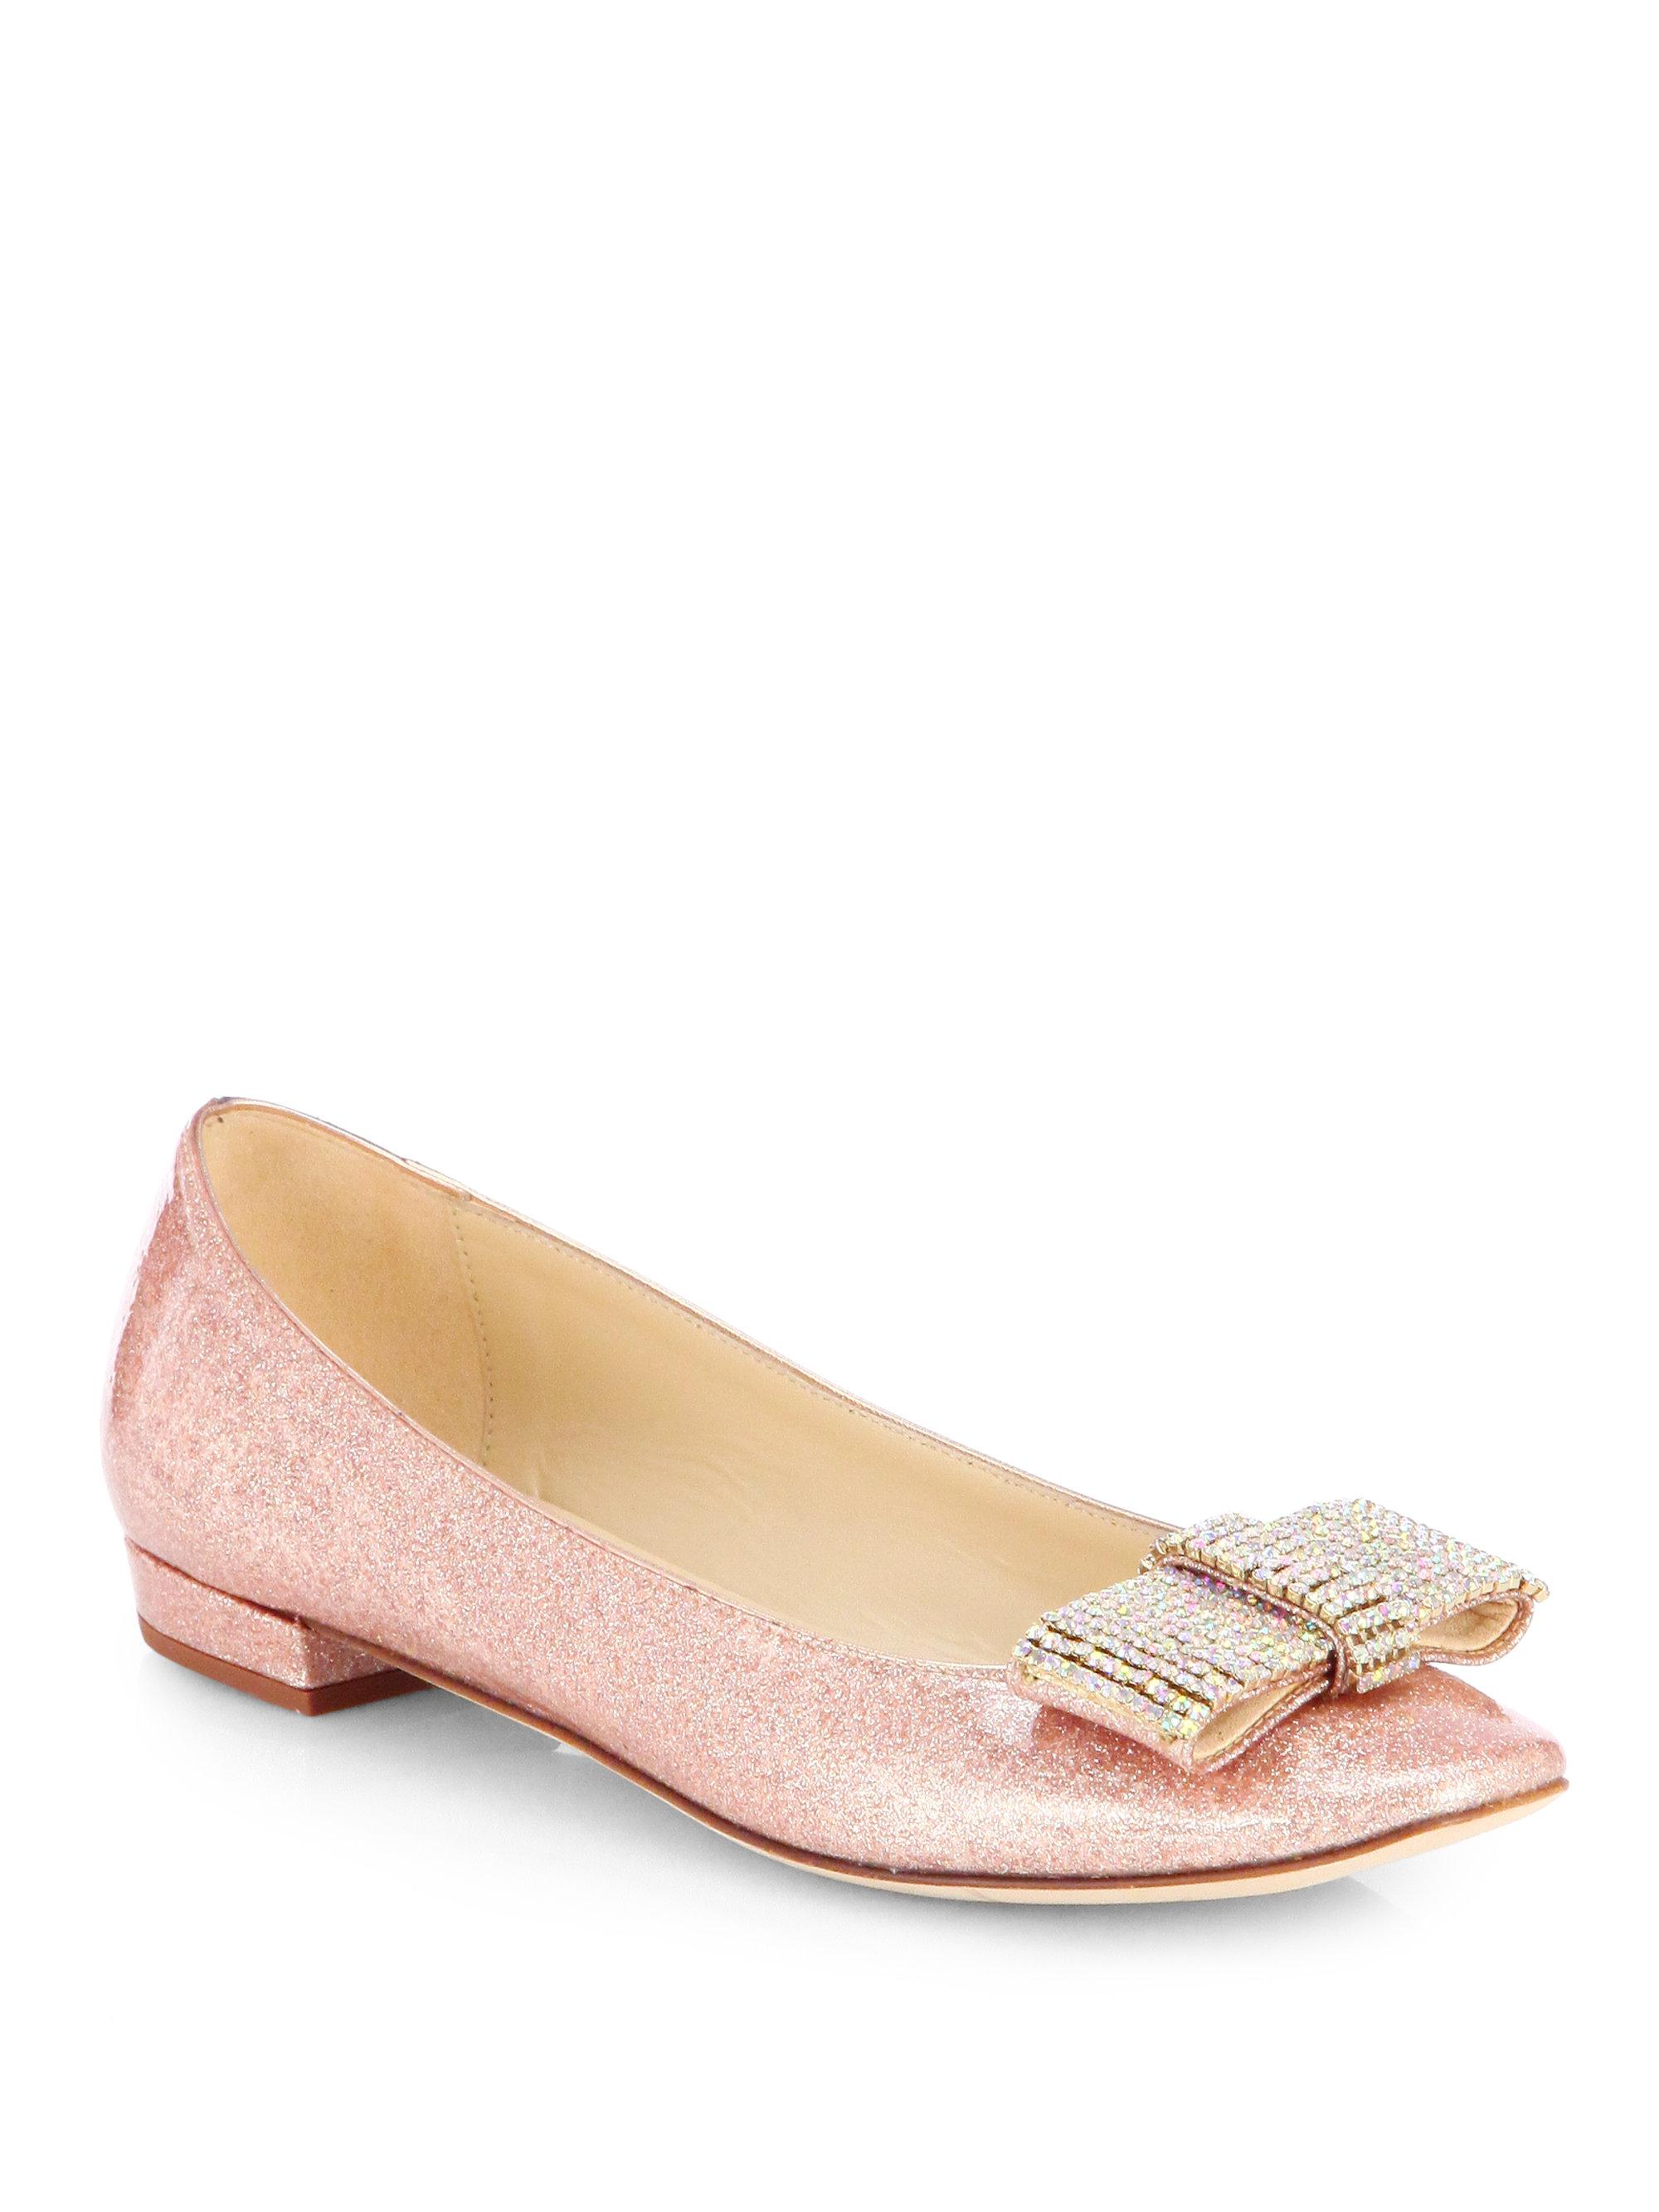 b3ed002f903 Kate Spade Niesha Glitter Bow Ballet Flats in Pink - Lyst